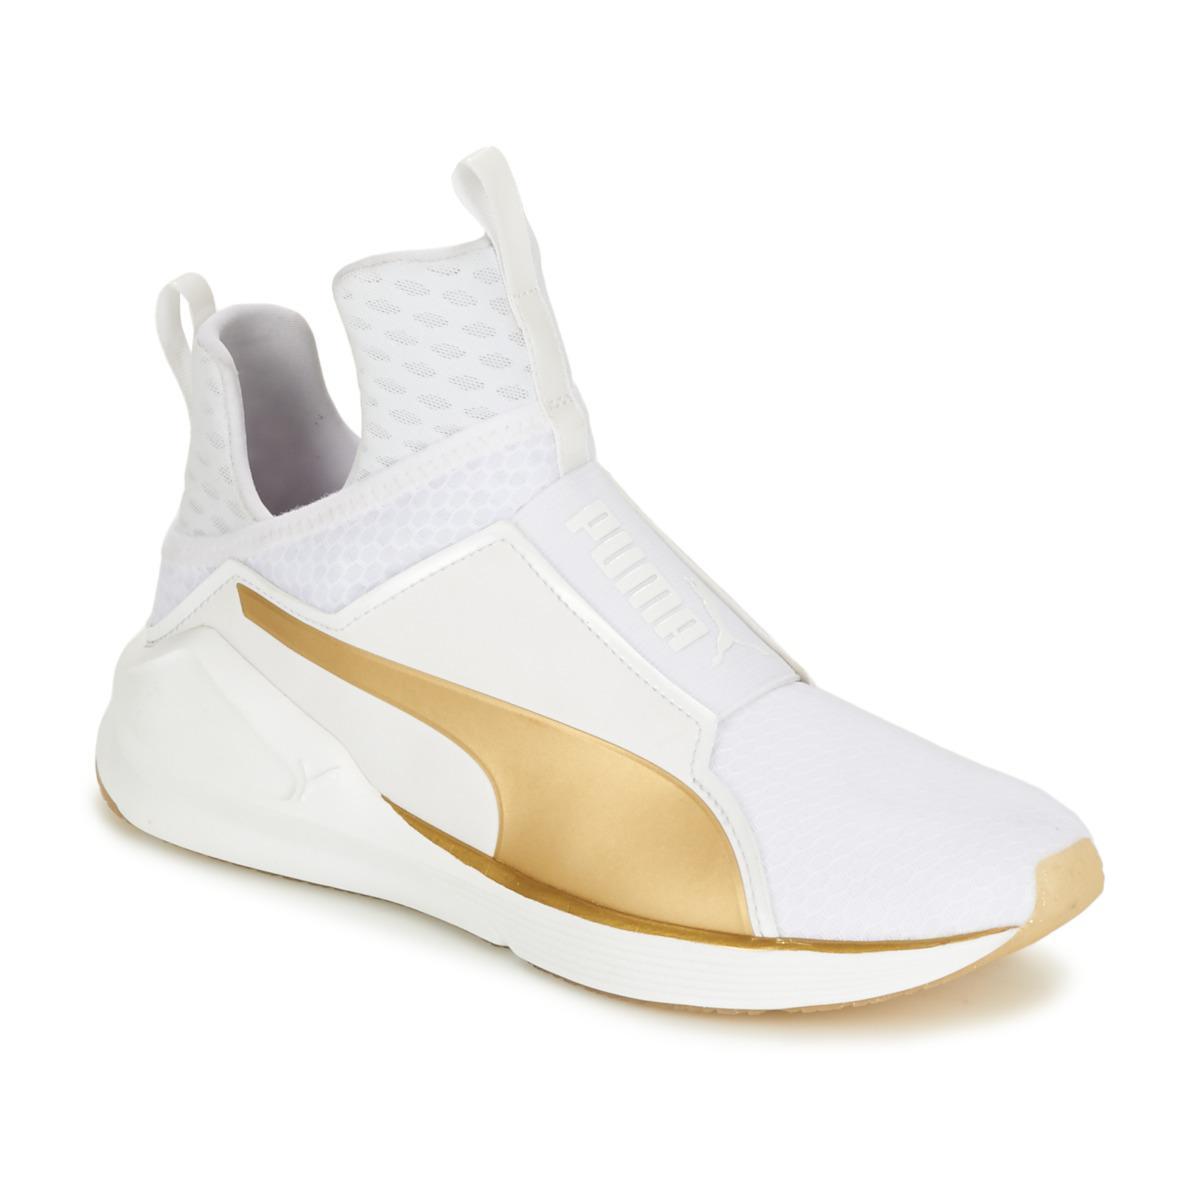 PUMA Fierce Gold Women s Shoes (high-top Trainers) In White in White ... e1c7e75bb